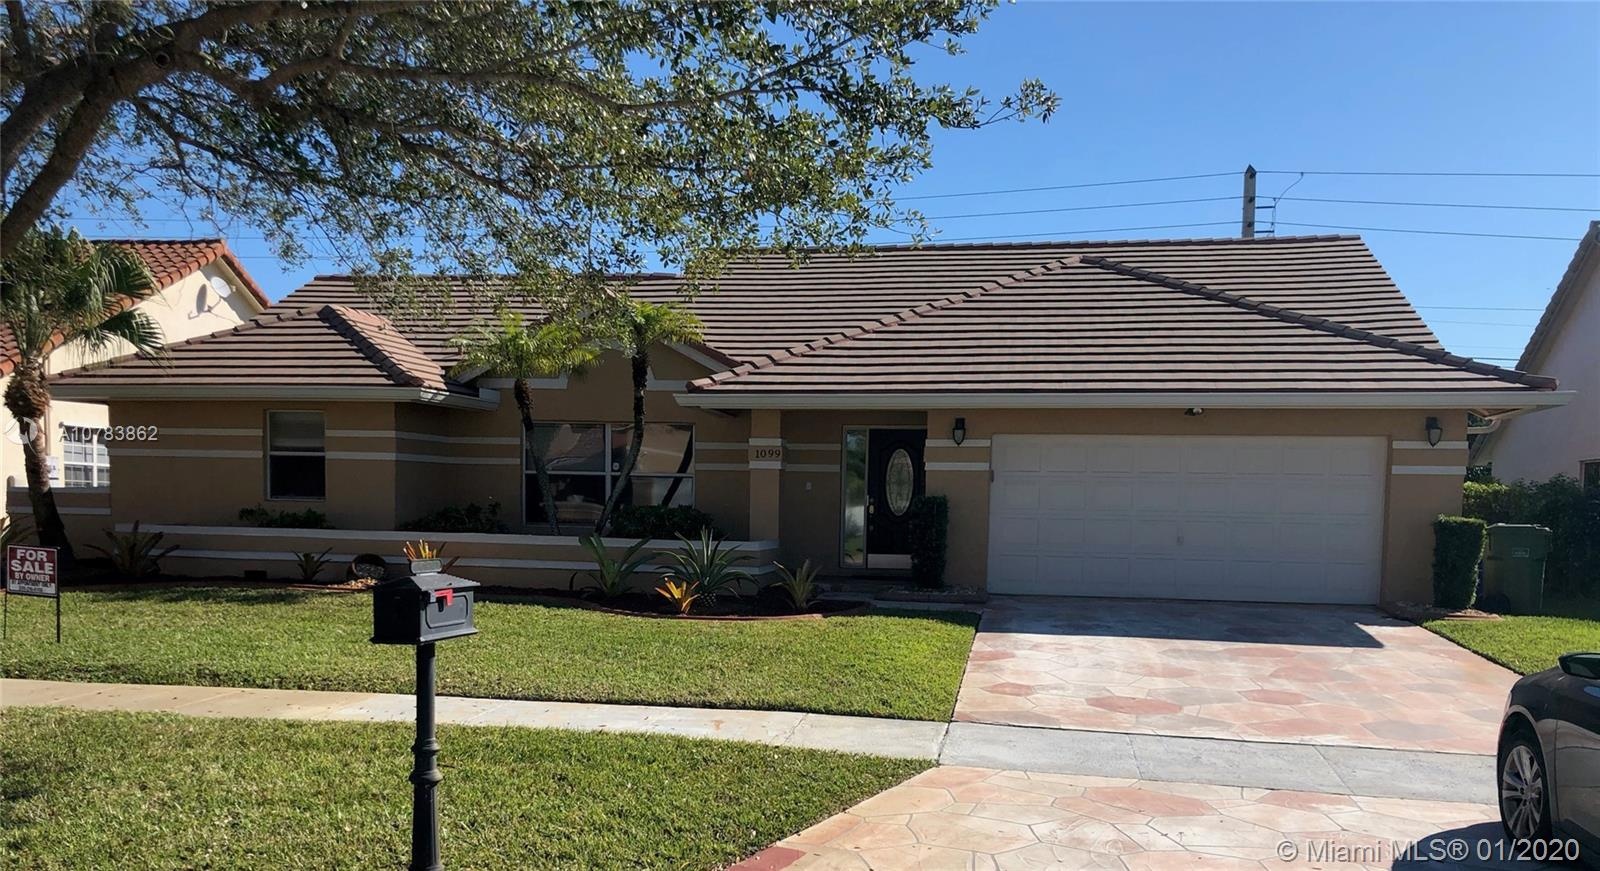 1099 NW 161st Ave, Pembroke Pines, FL 33028